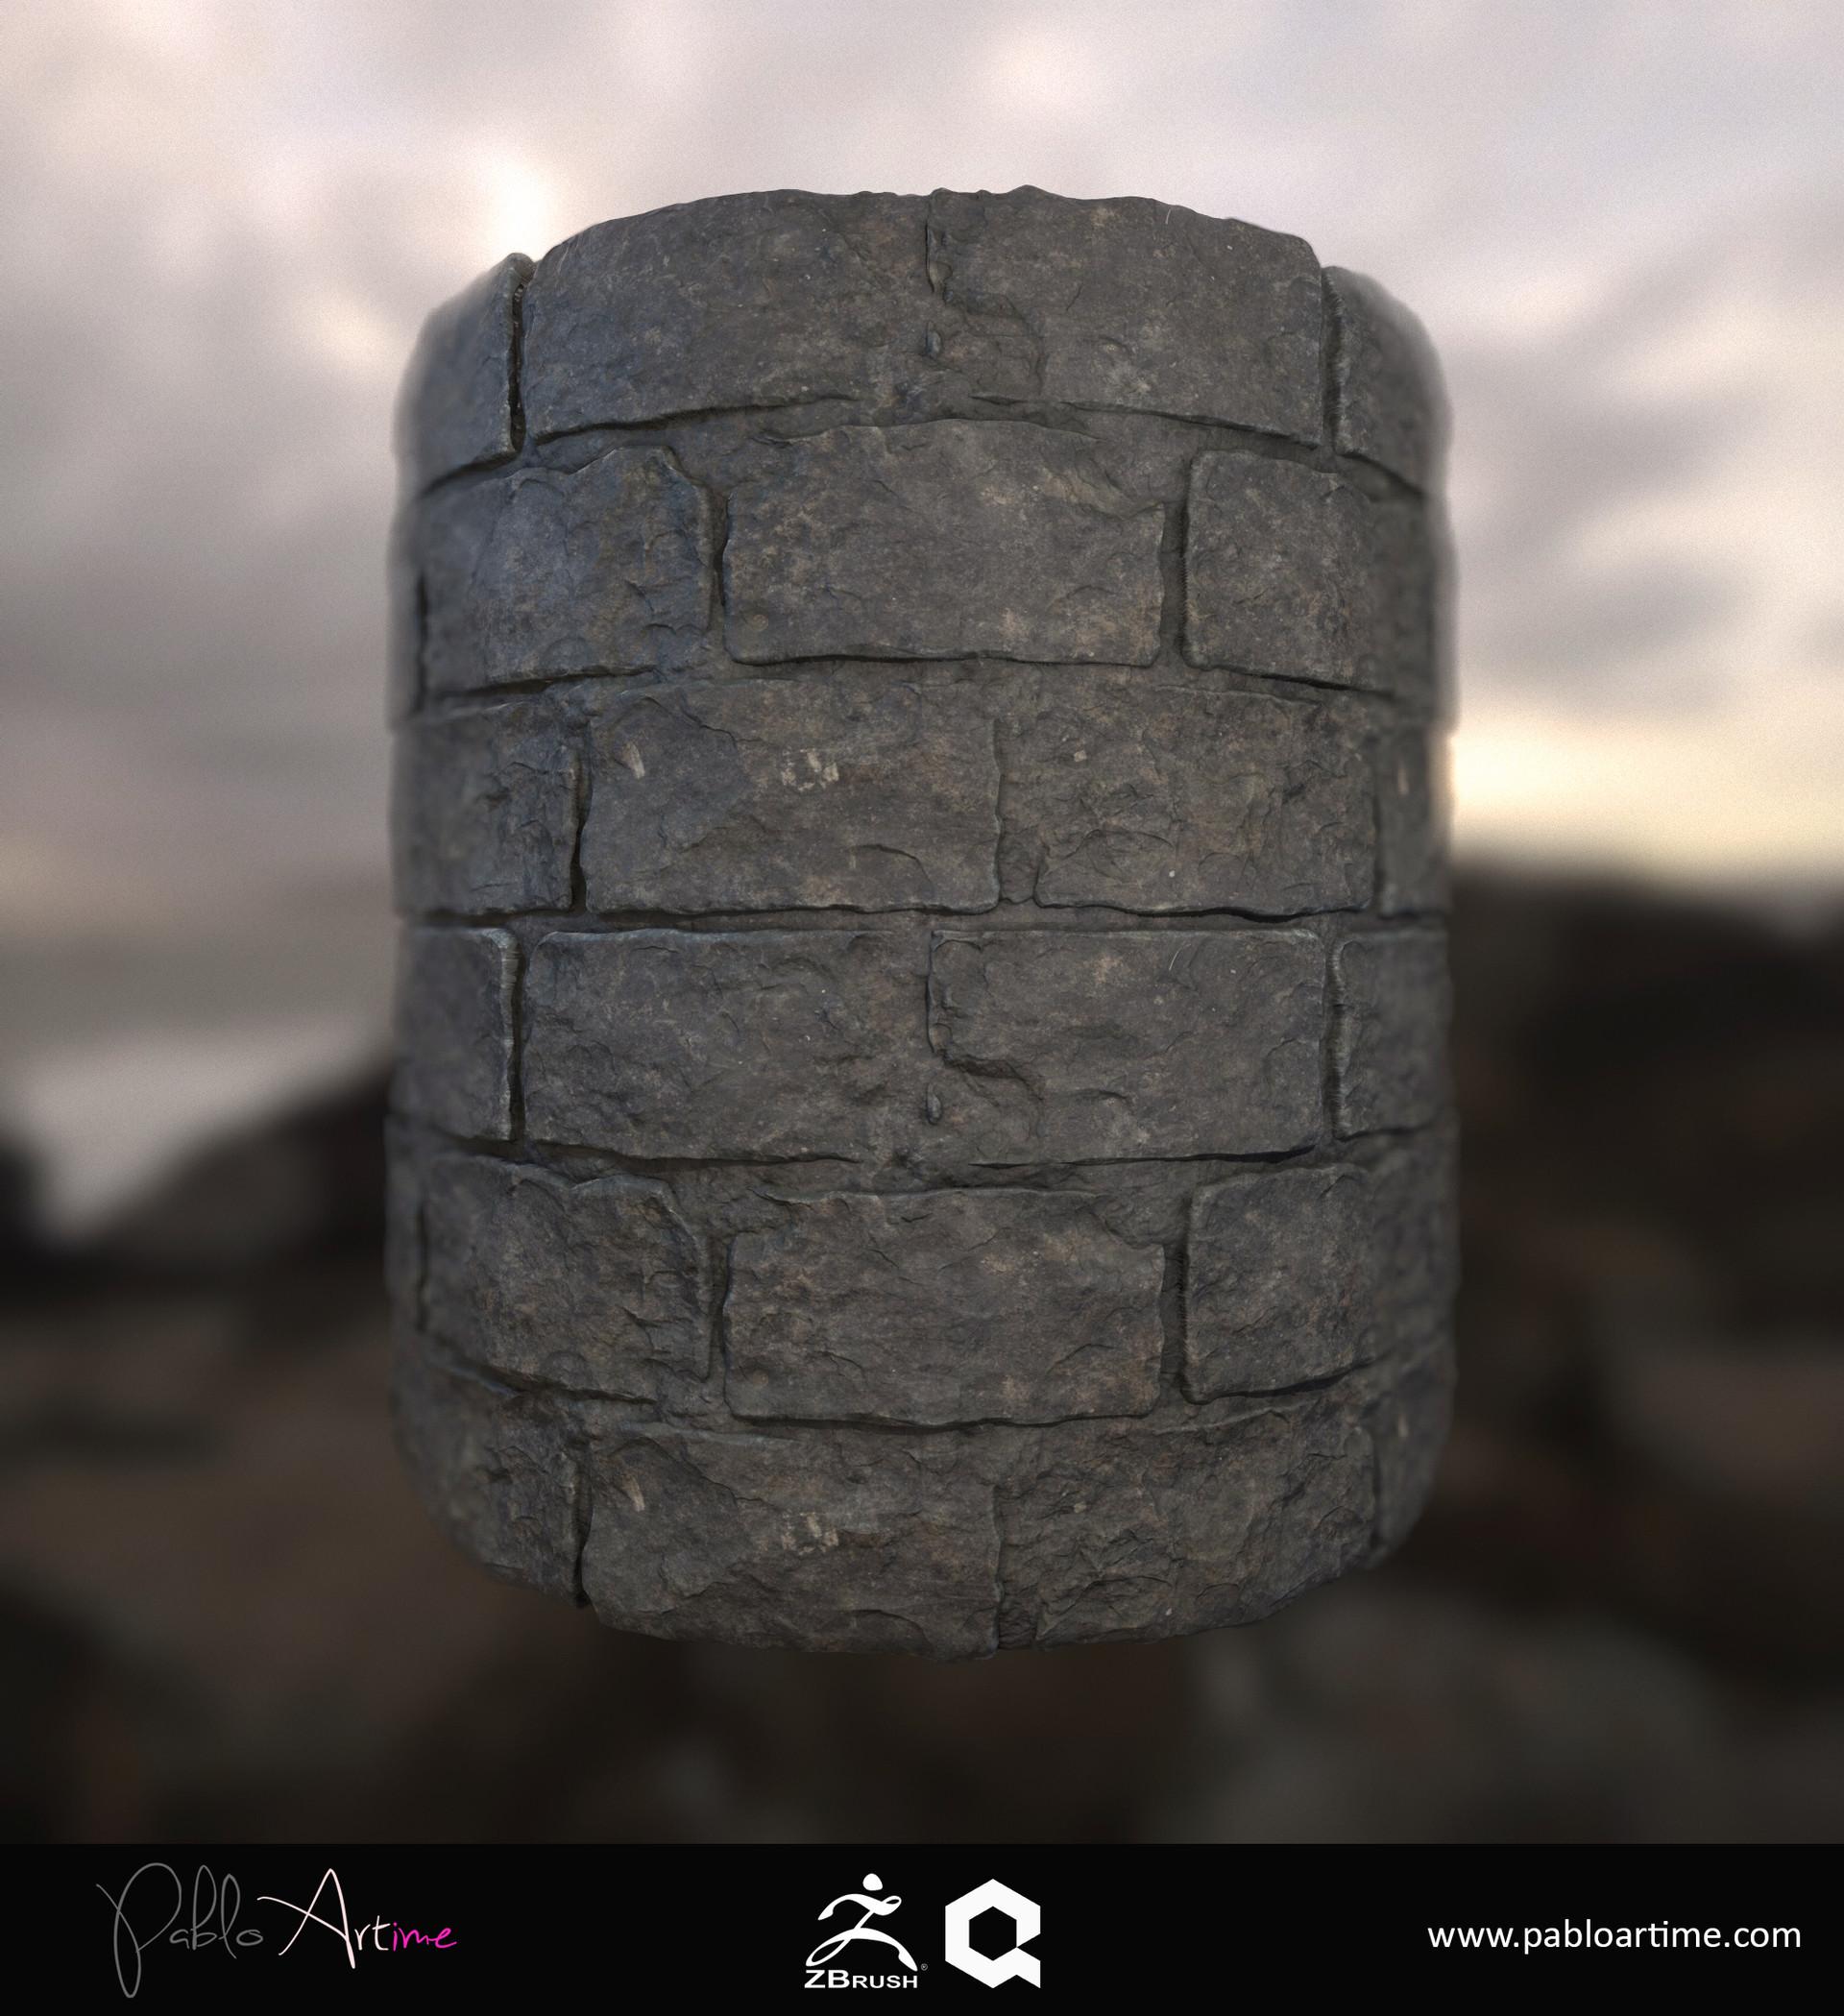 Pablo artime roca